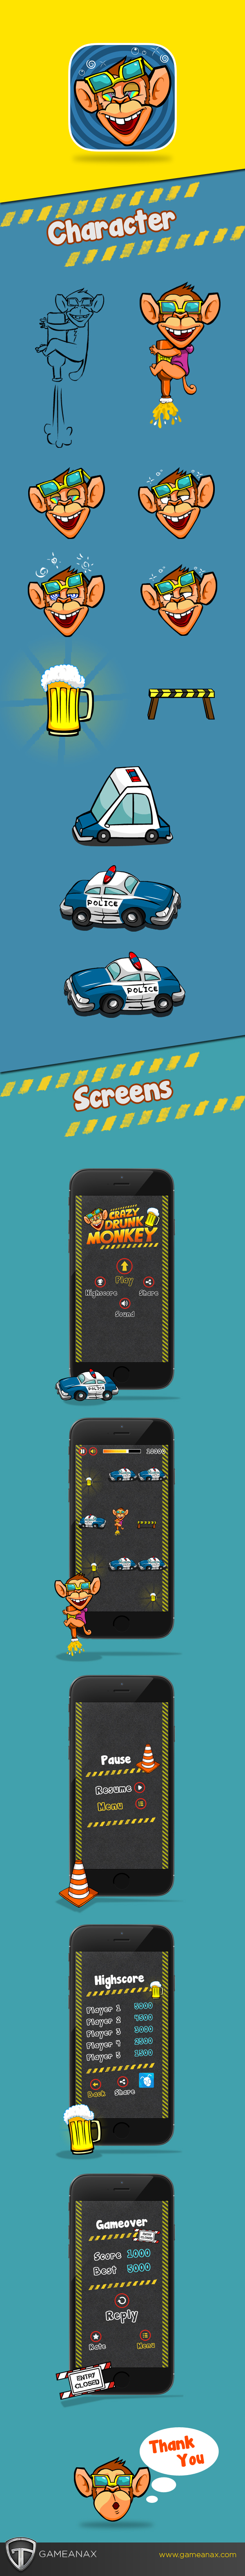 mobile gaming Gaming Games iPad iphone